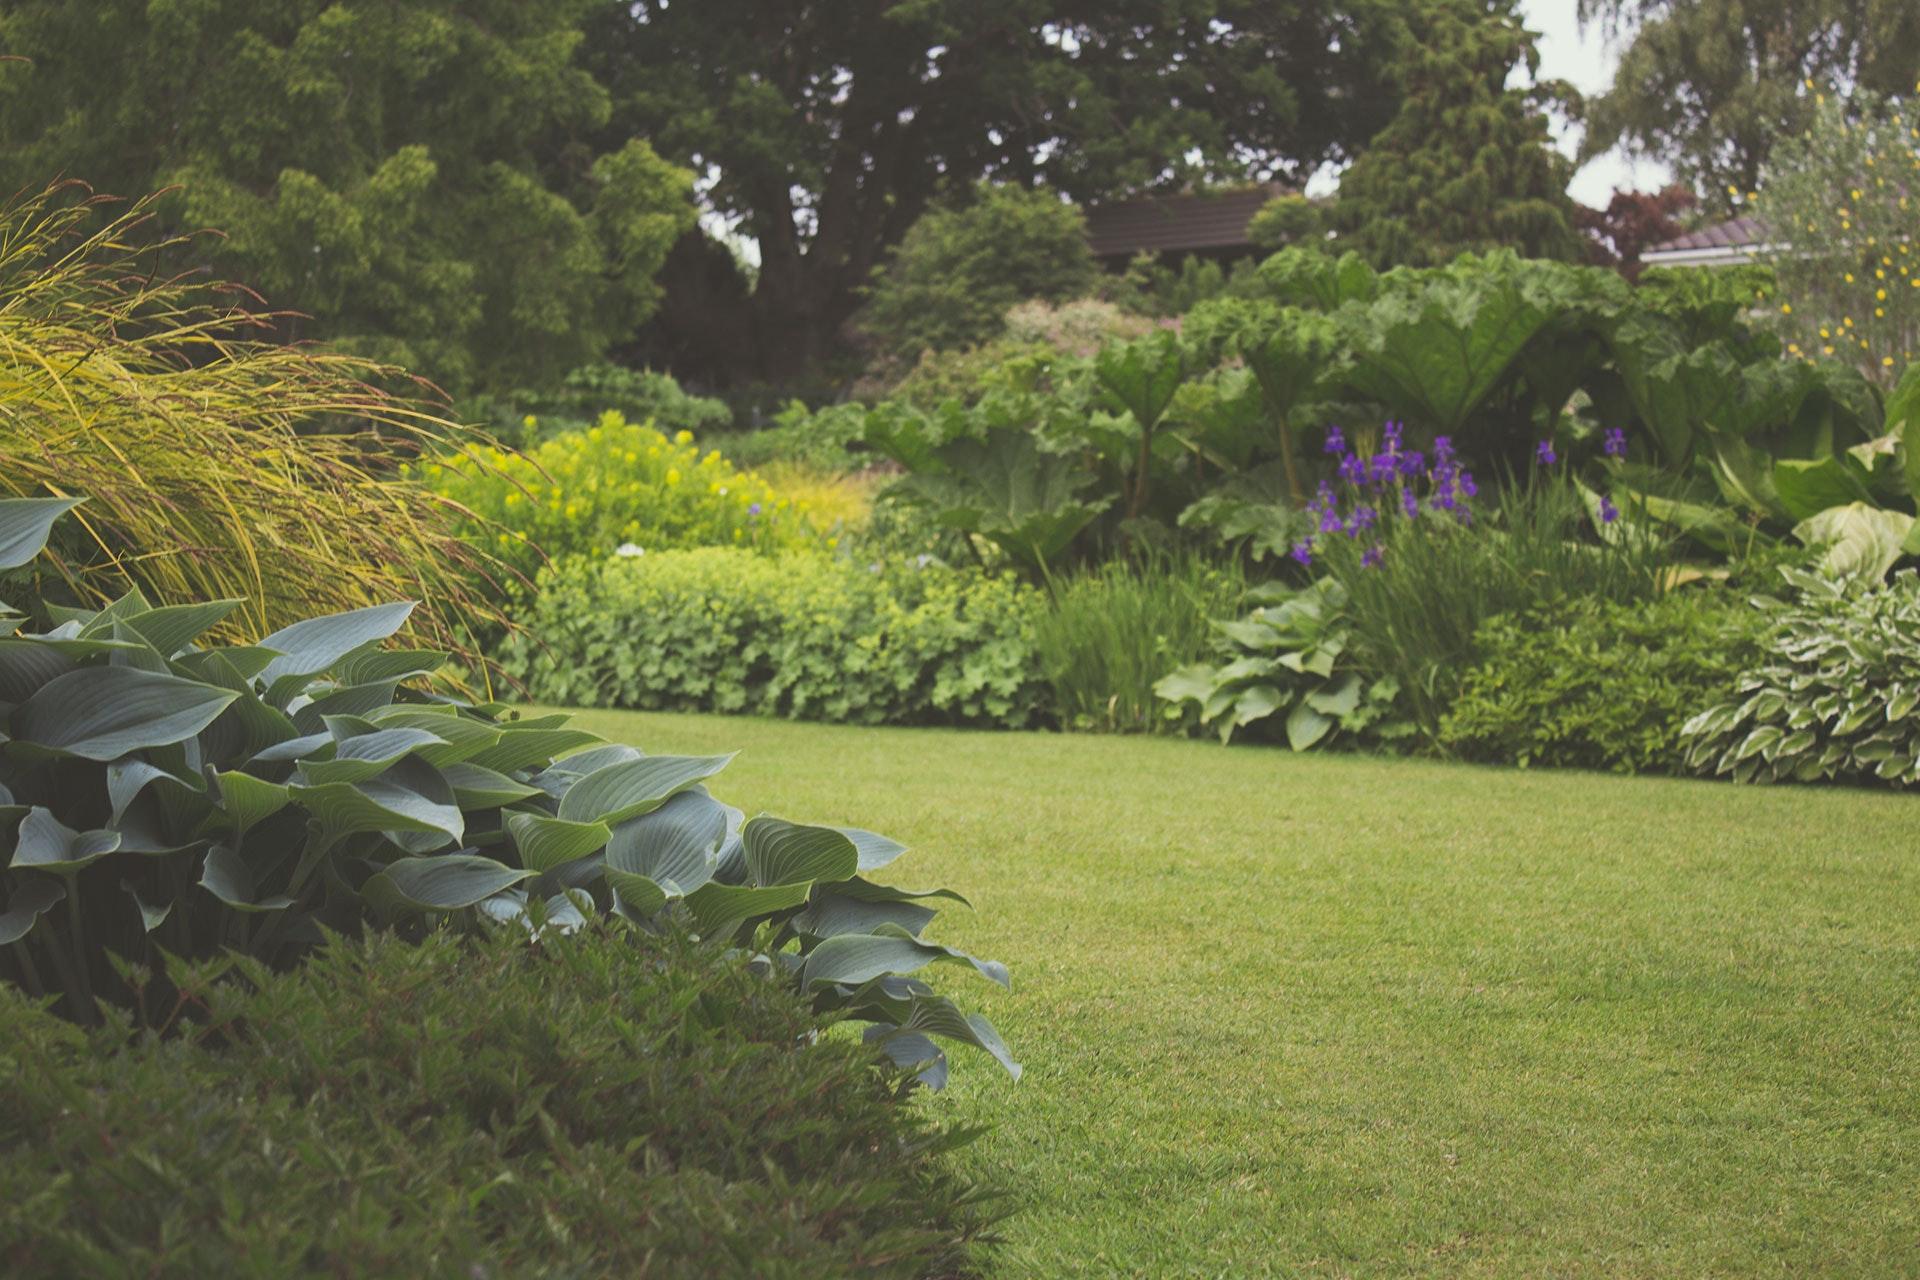 Ogrodowa terapia